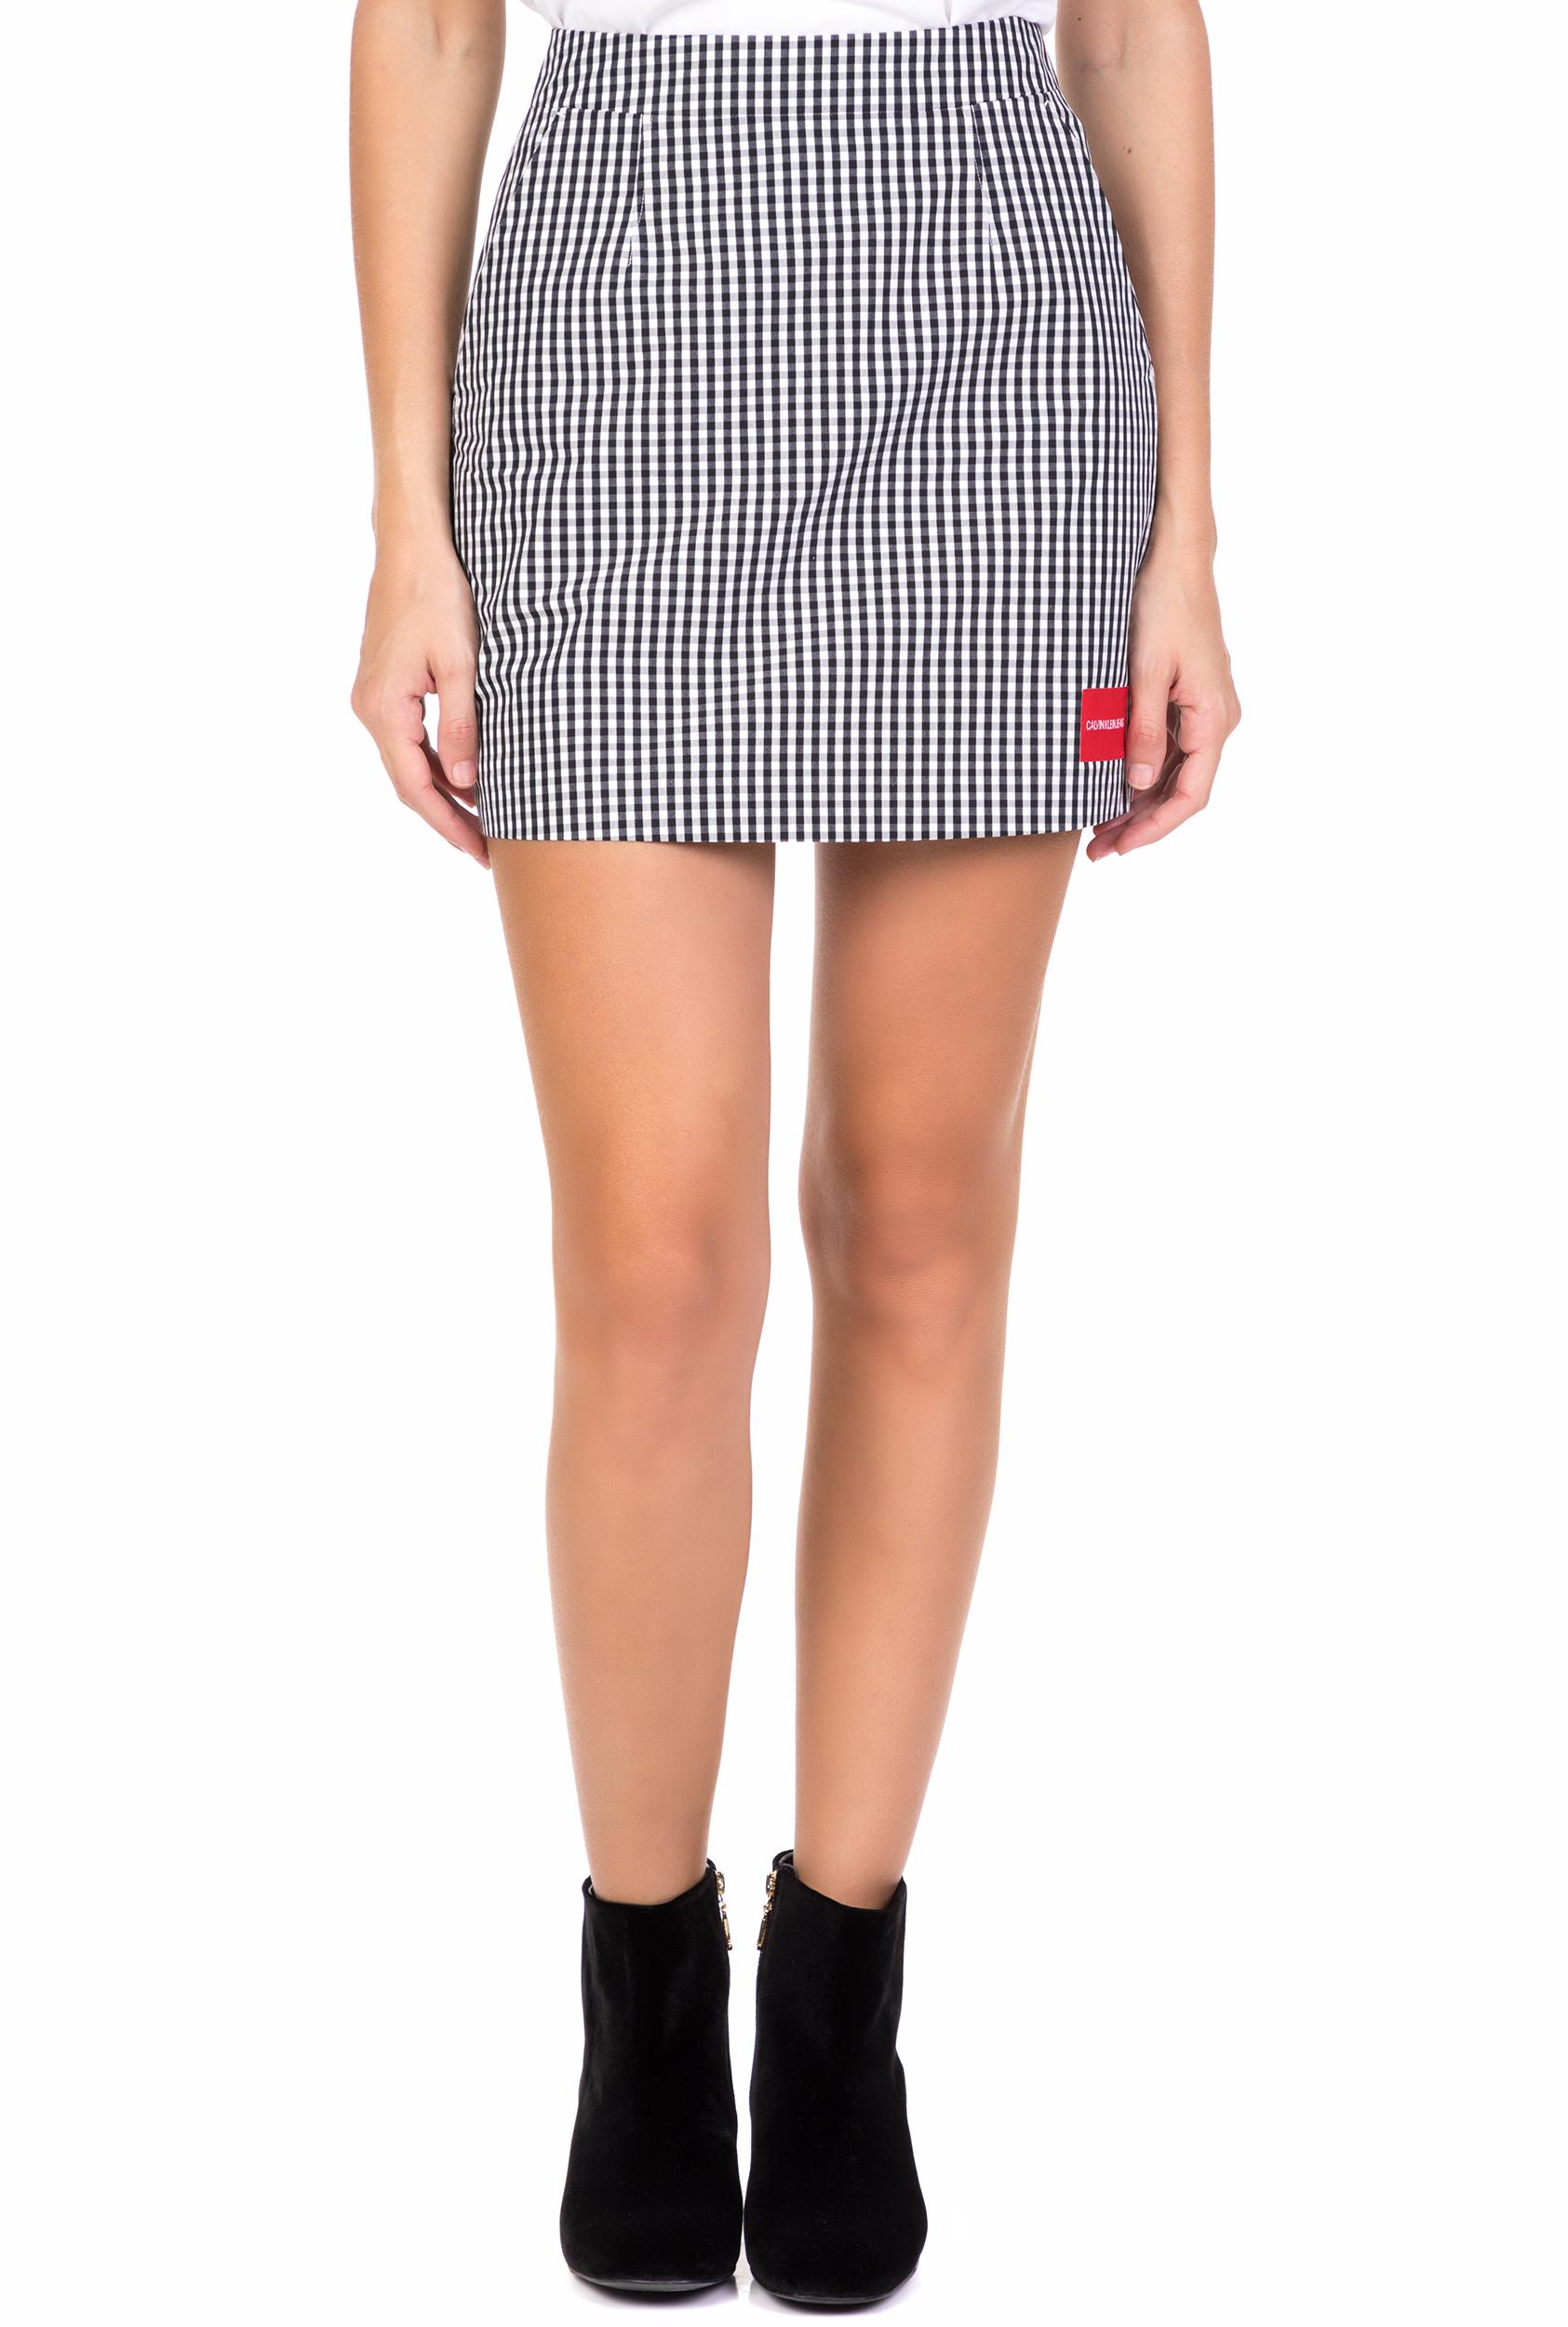 CALVIN KLEIN JEANS - Γυναικεία mini φούστα CALVIN KLEIN JEANS GINGHAM λευκή μαύρη